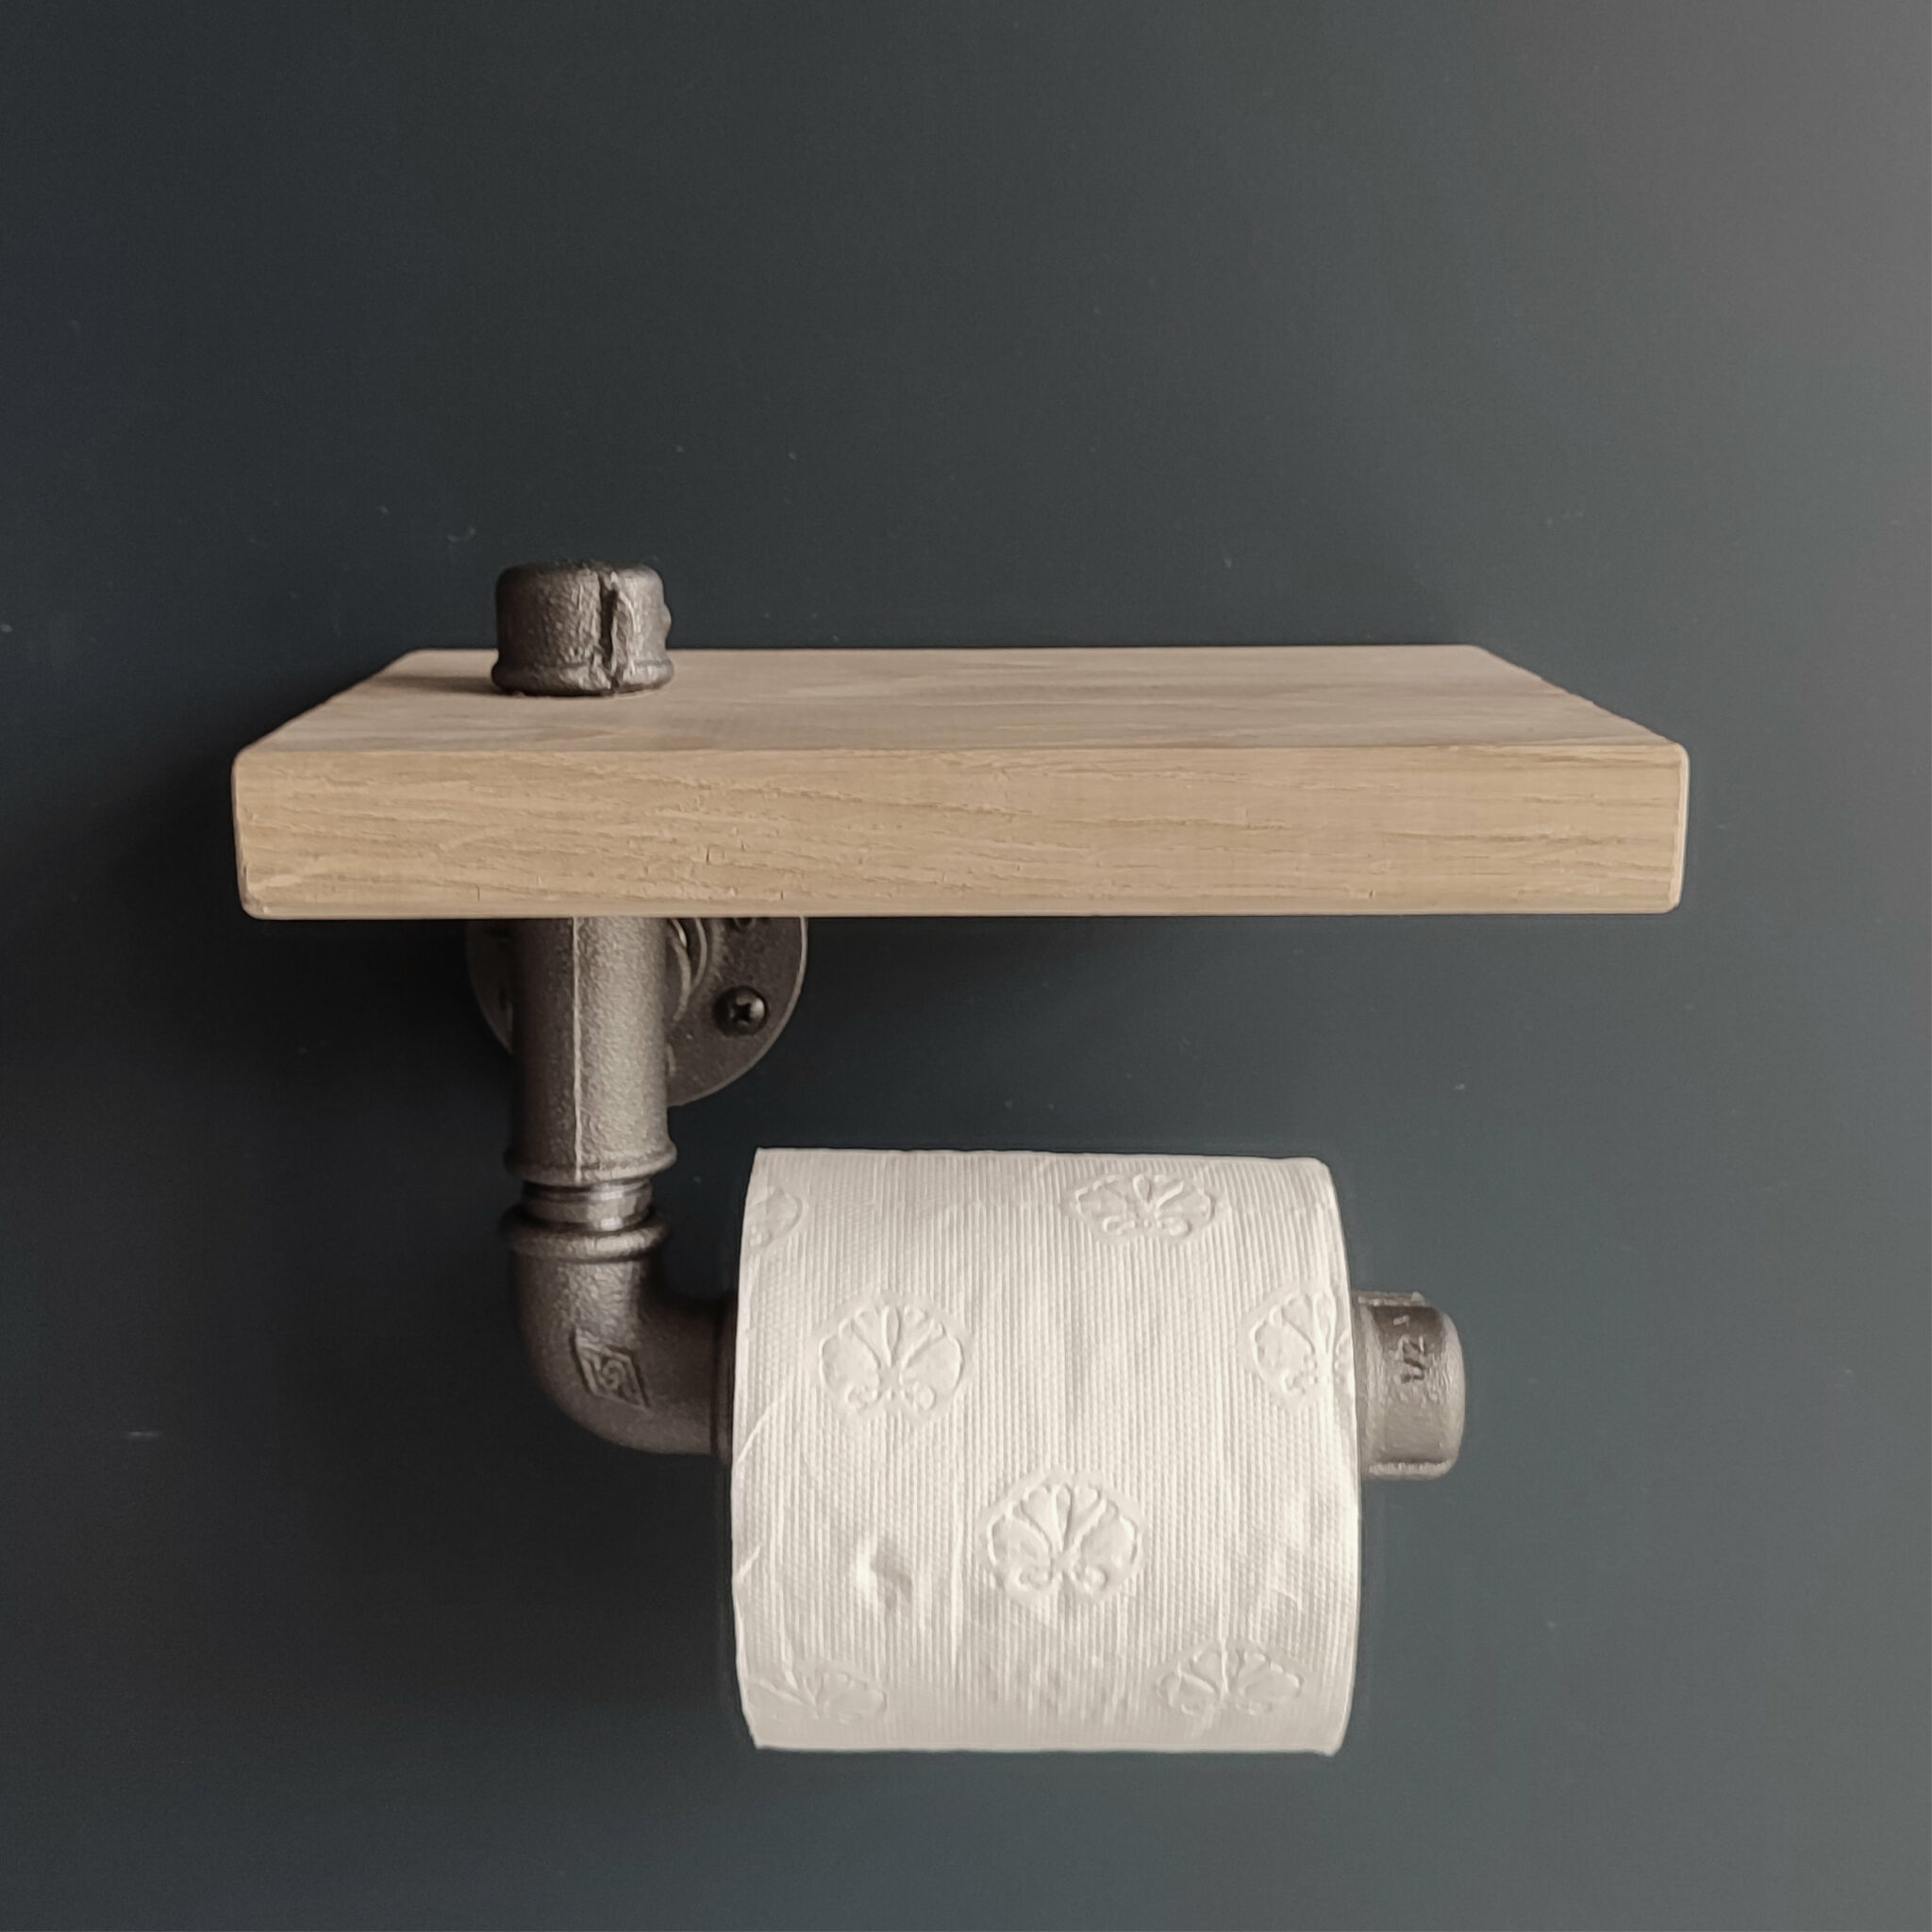 Porte rouleau WC bois – étagère chêne – MCFK0150000W1